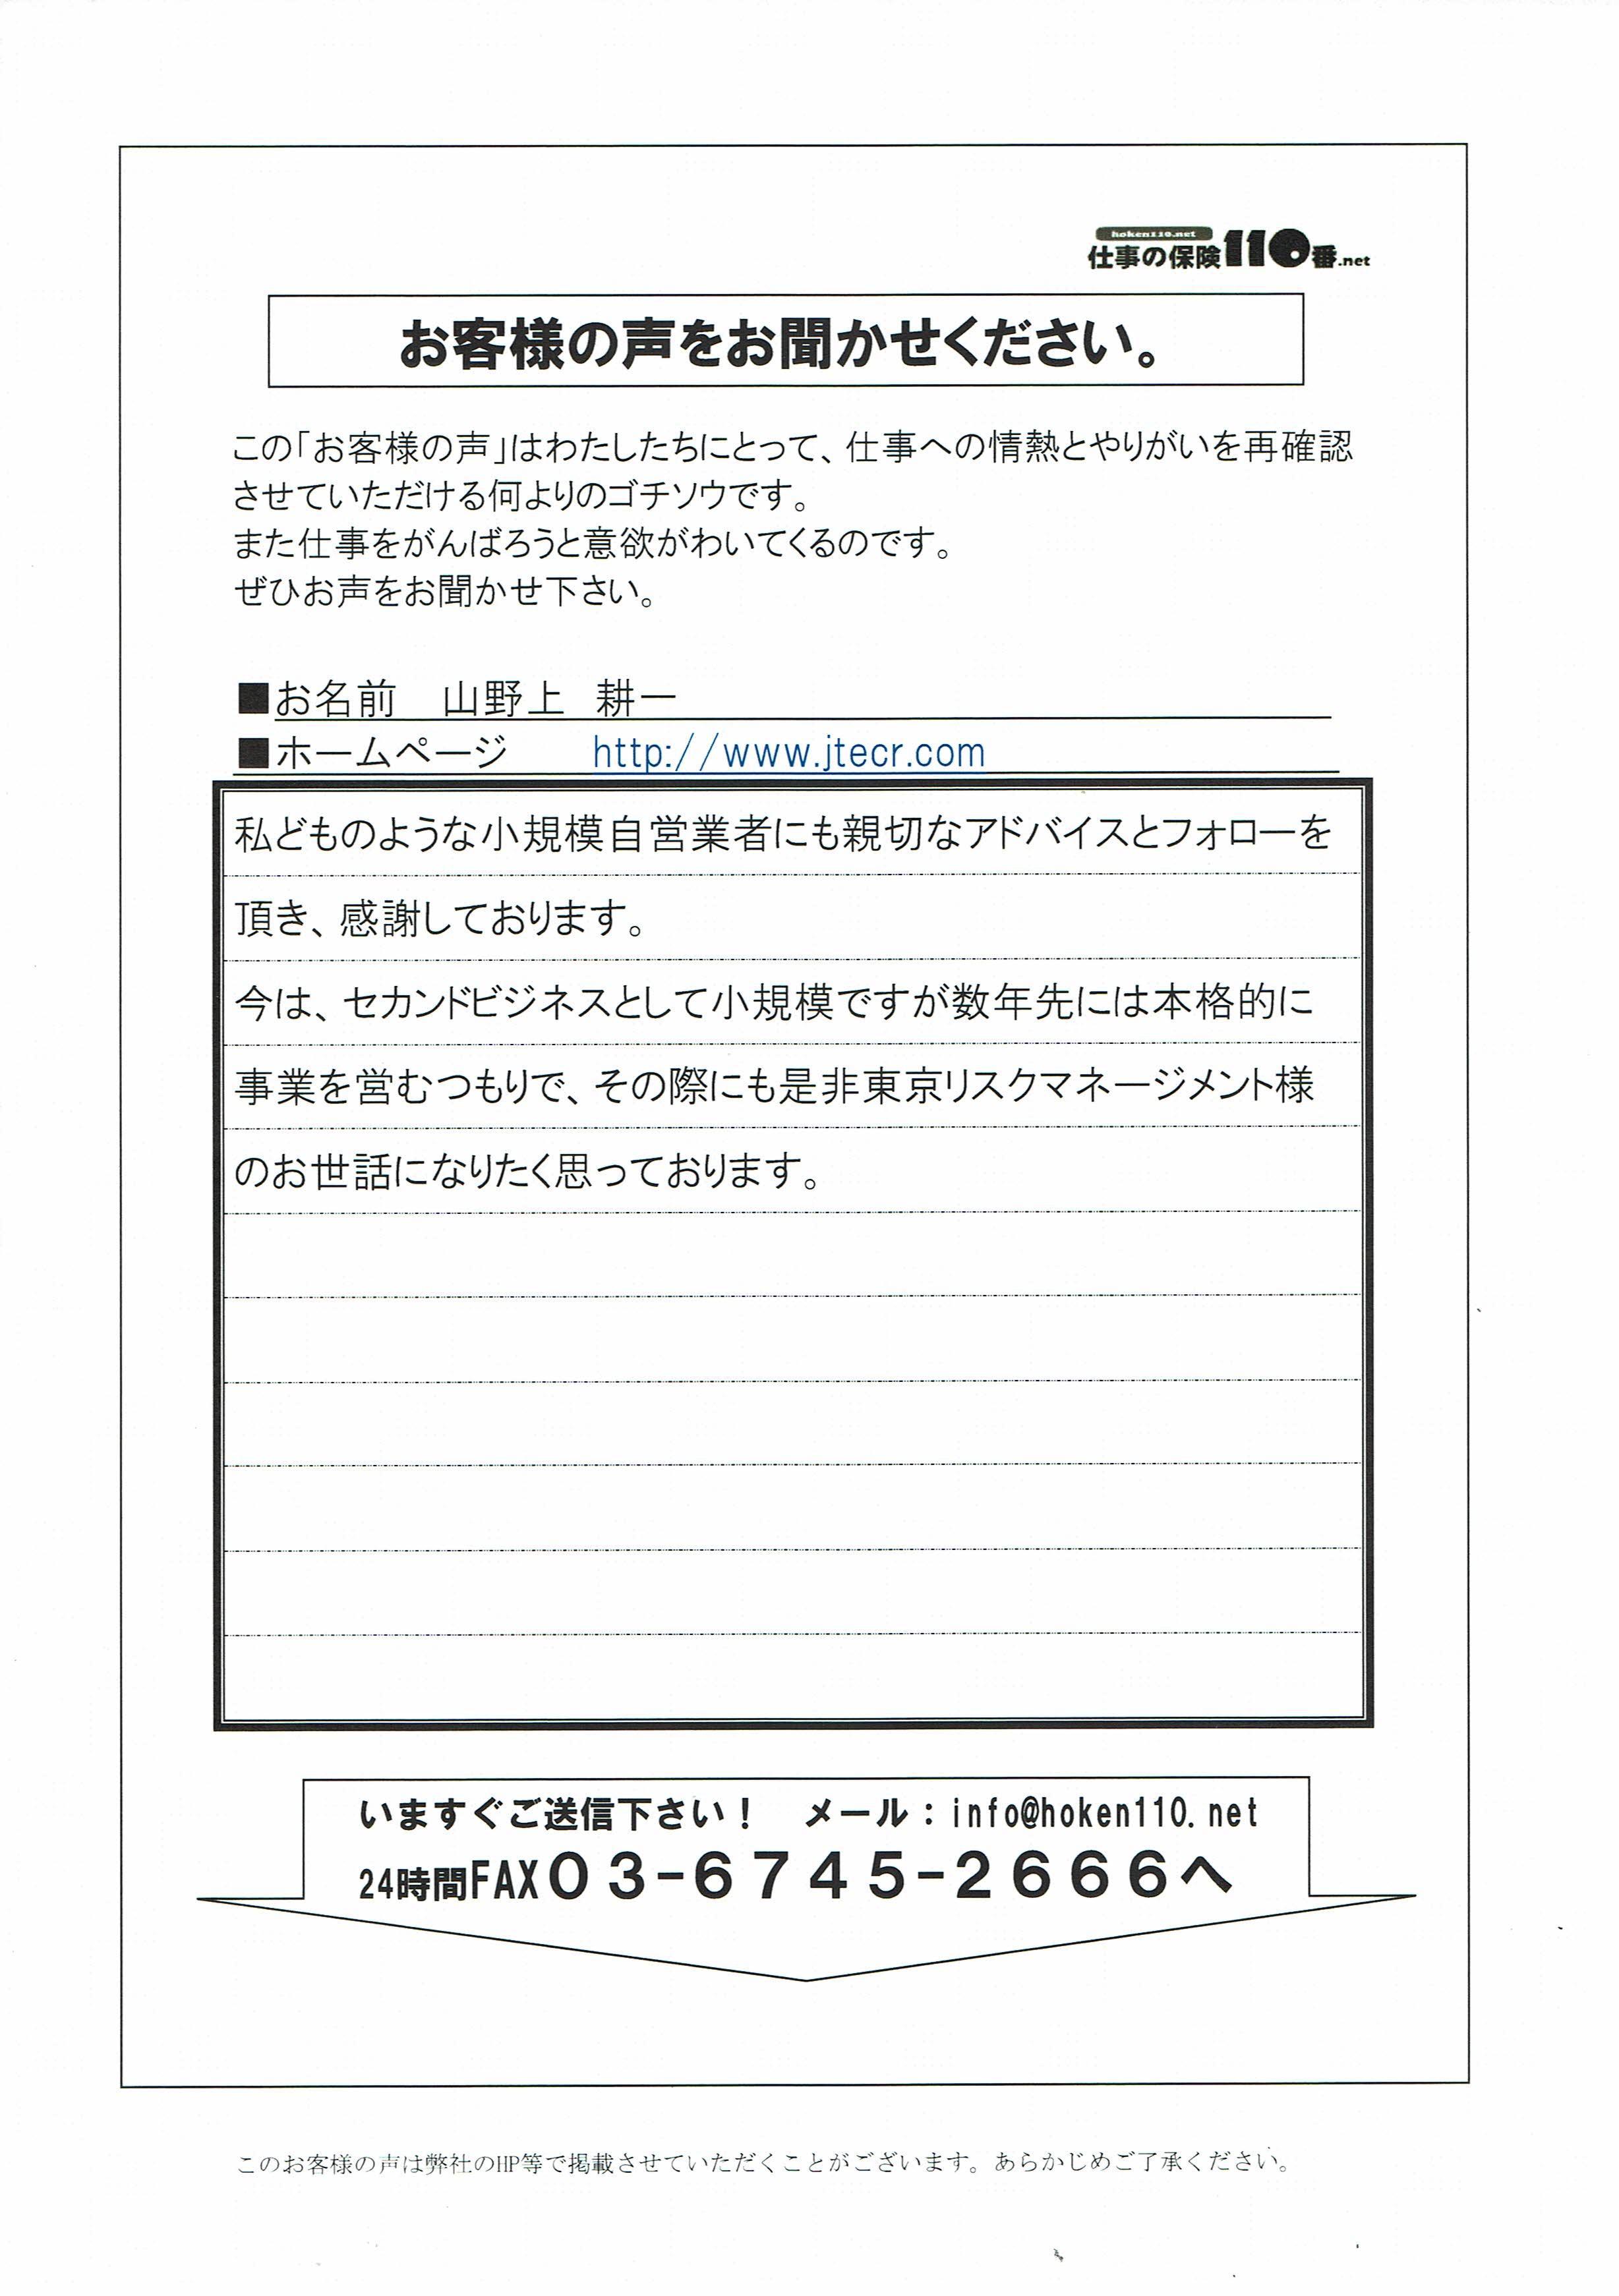 https://syotoku.biz/yamanouekoe.jpg